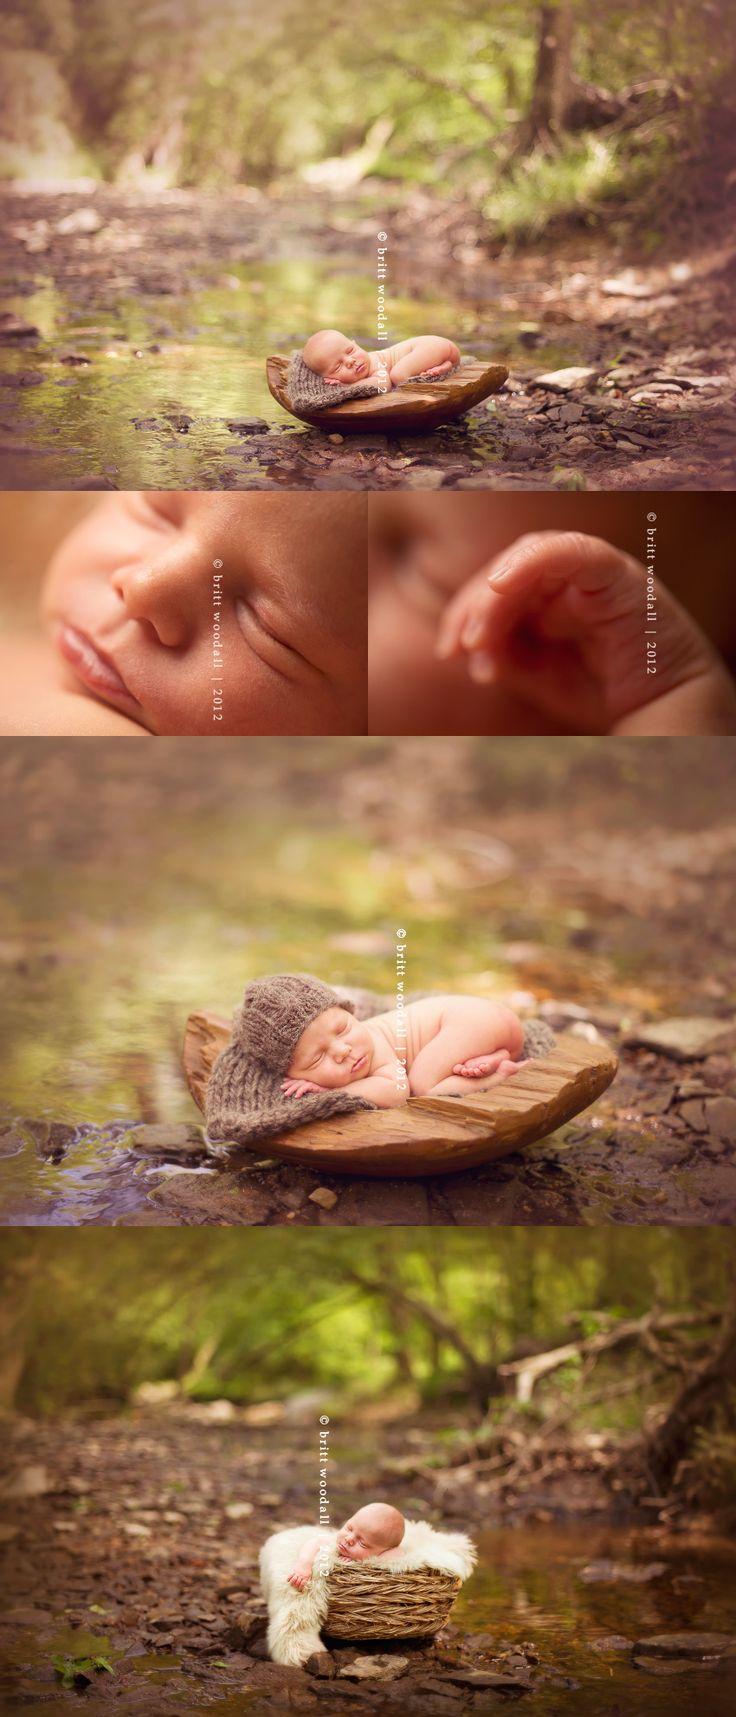 raleigh north carolina newborn baby photography by britt woodall